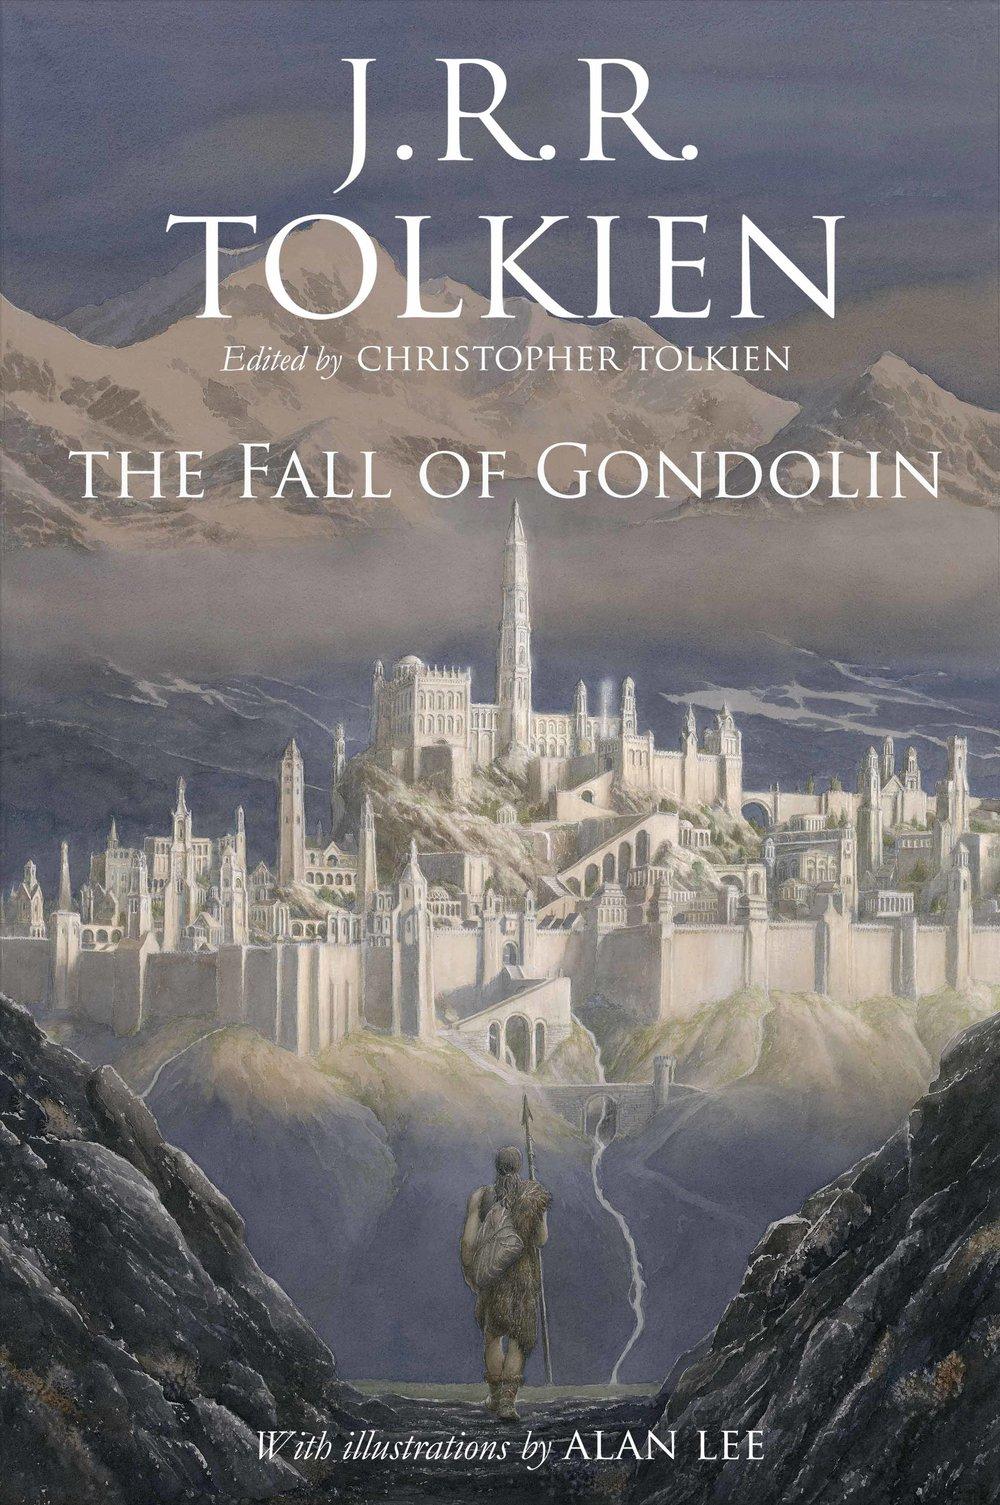 the fall of gondolin.jpg